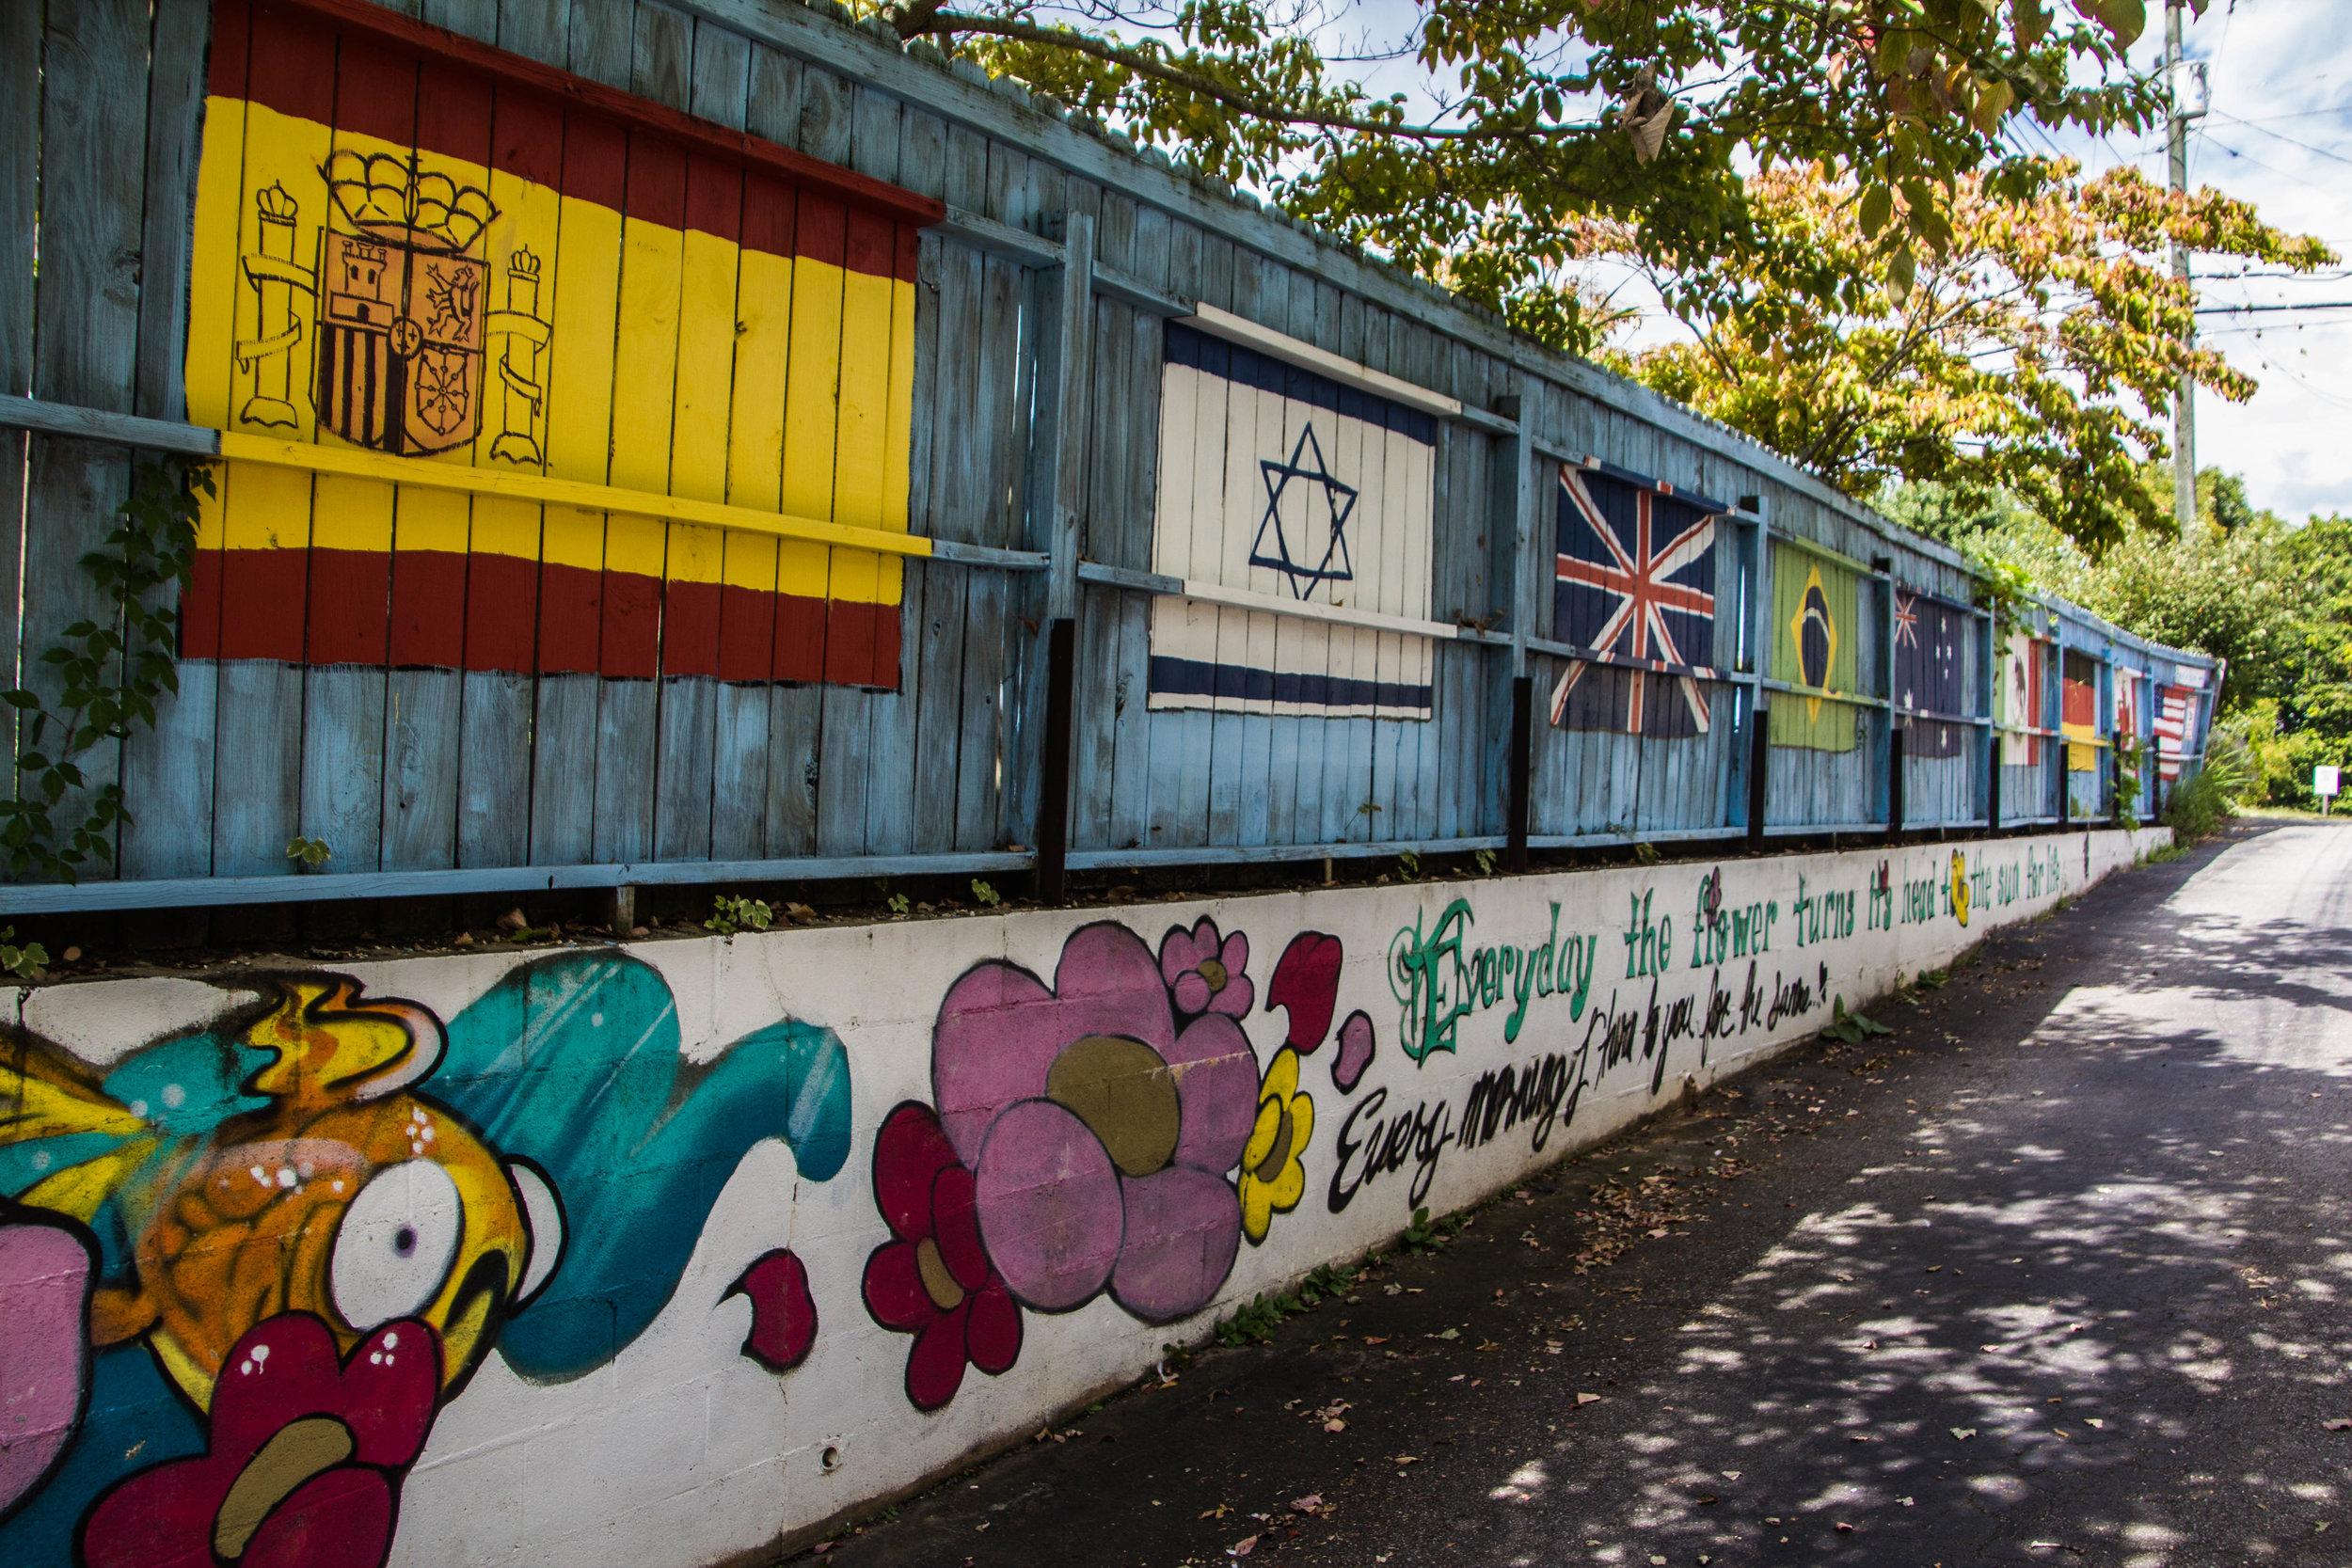 street-art-asheville-north-carolina-31.jpg